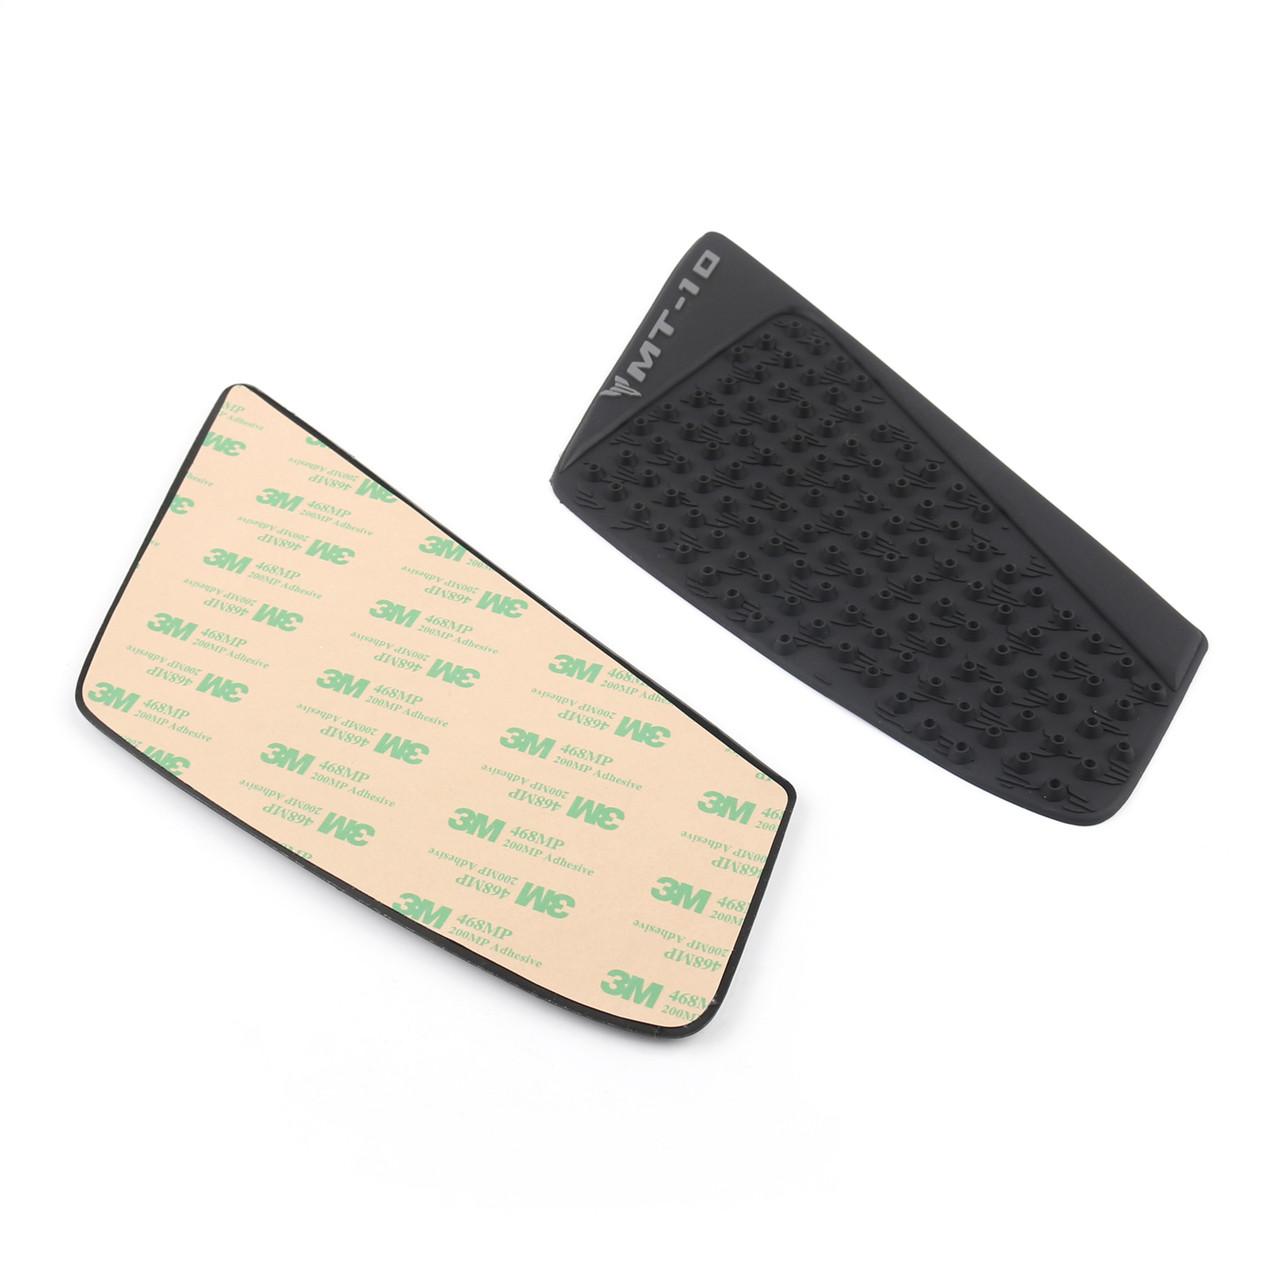 http://www.madhornets.store/AMZ/MotoPart/Tank%20Pad/LOGO/Side-081/Side-081-Black-3.jpg